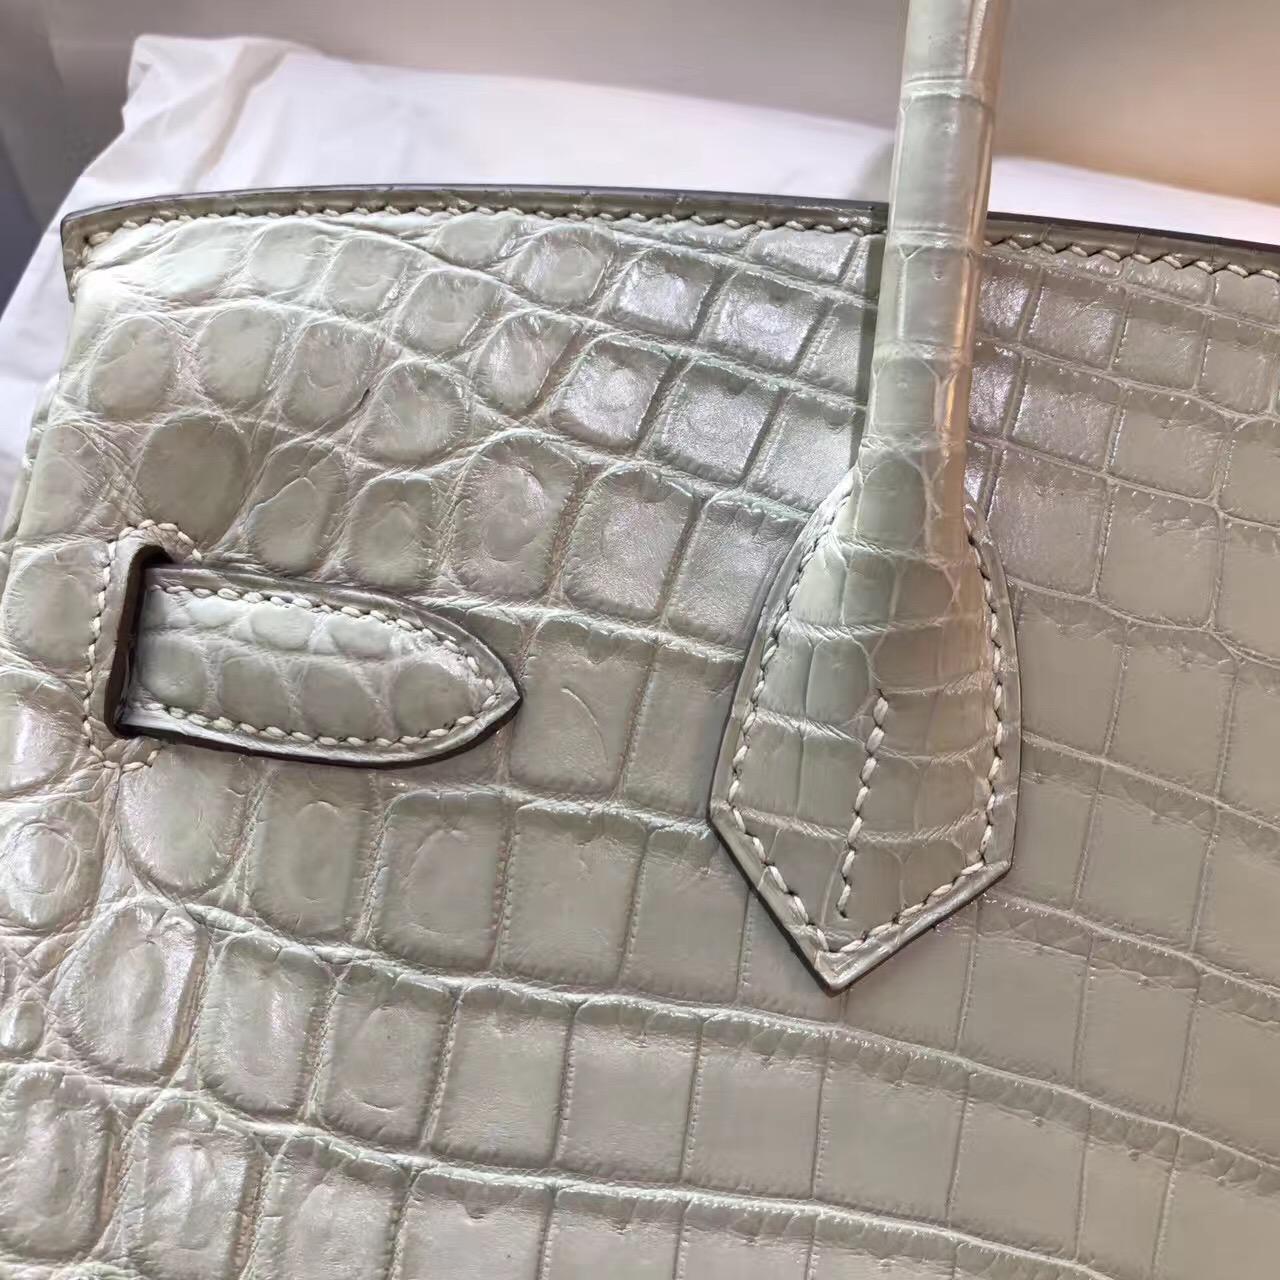 Hermes最出名的包袋鉑金包 Birkin 30鱷魚霧面 3C Parchemin 羊毛白金扣